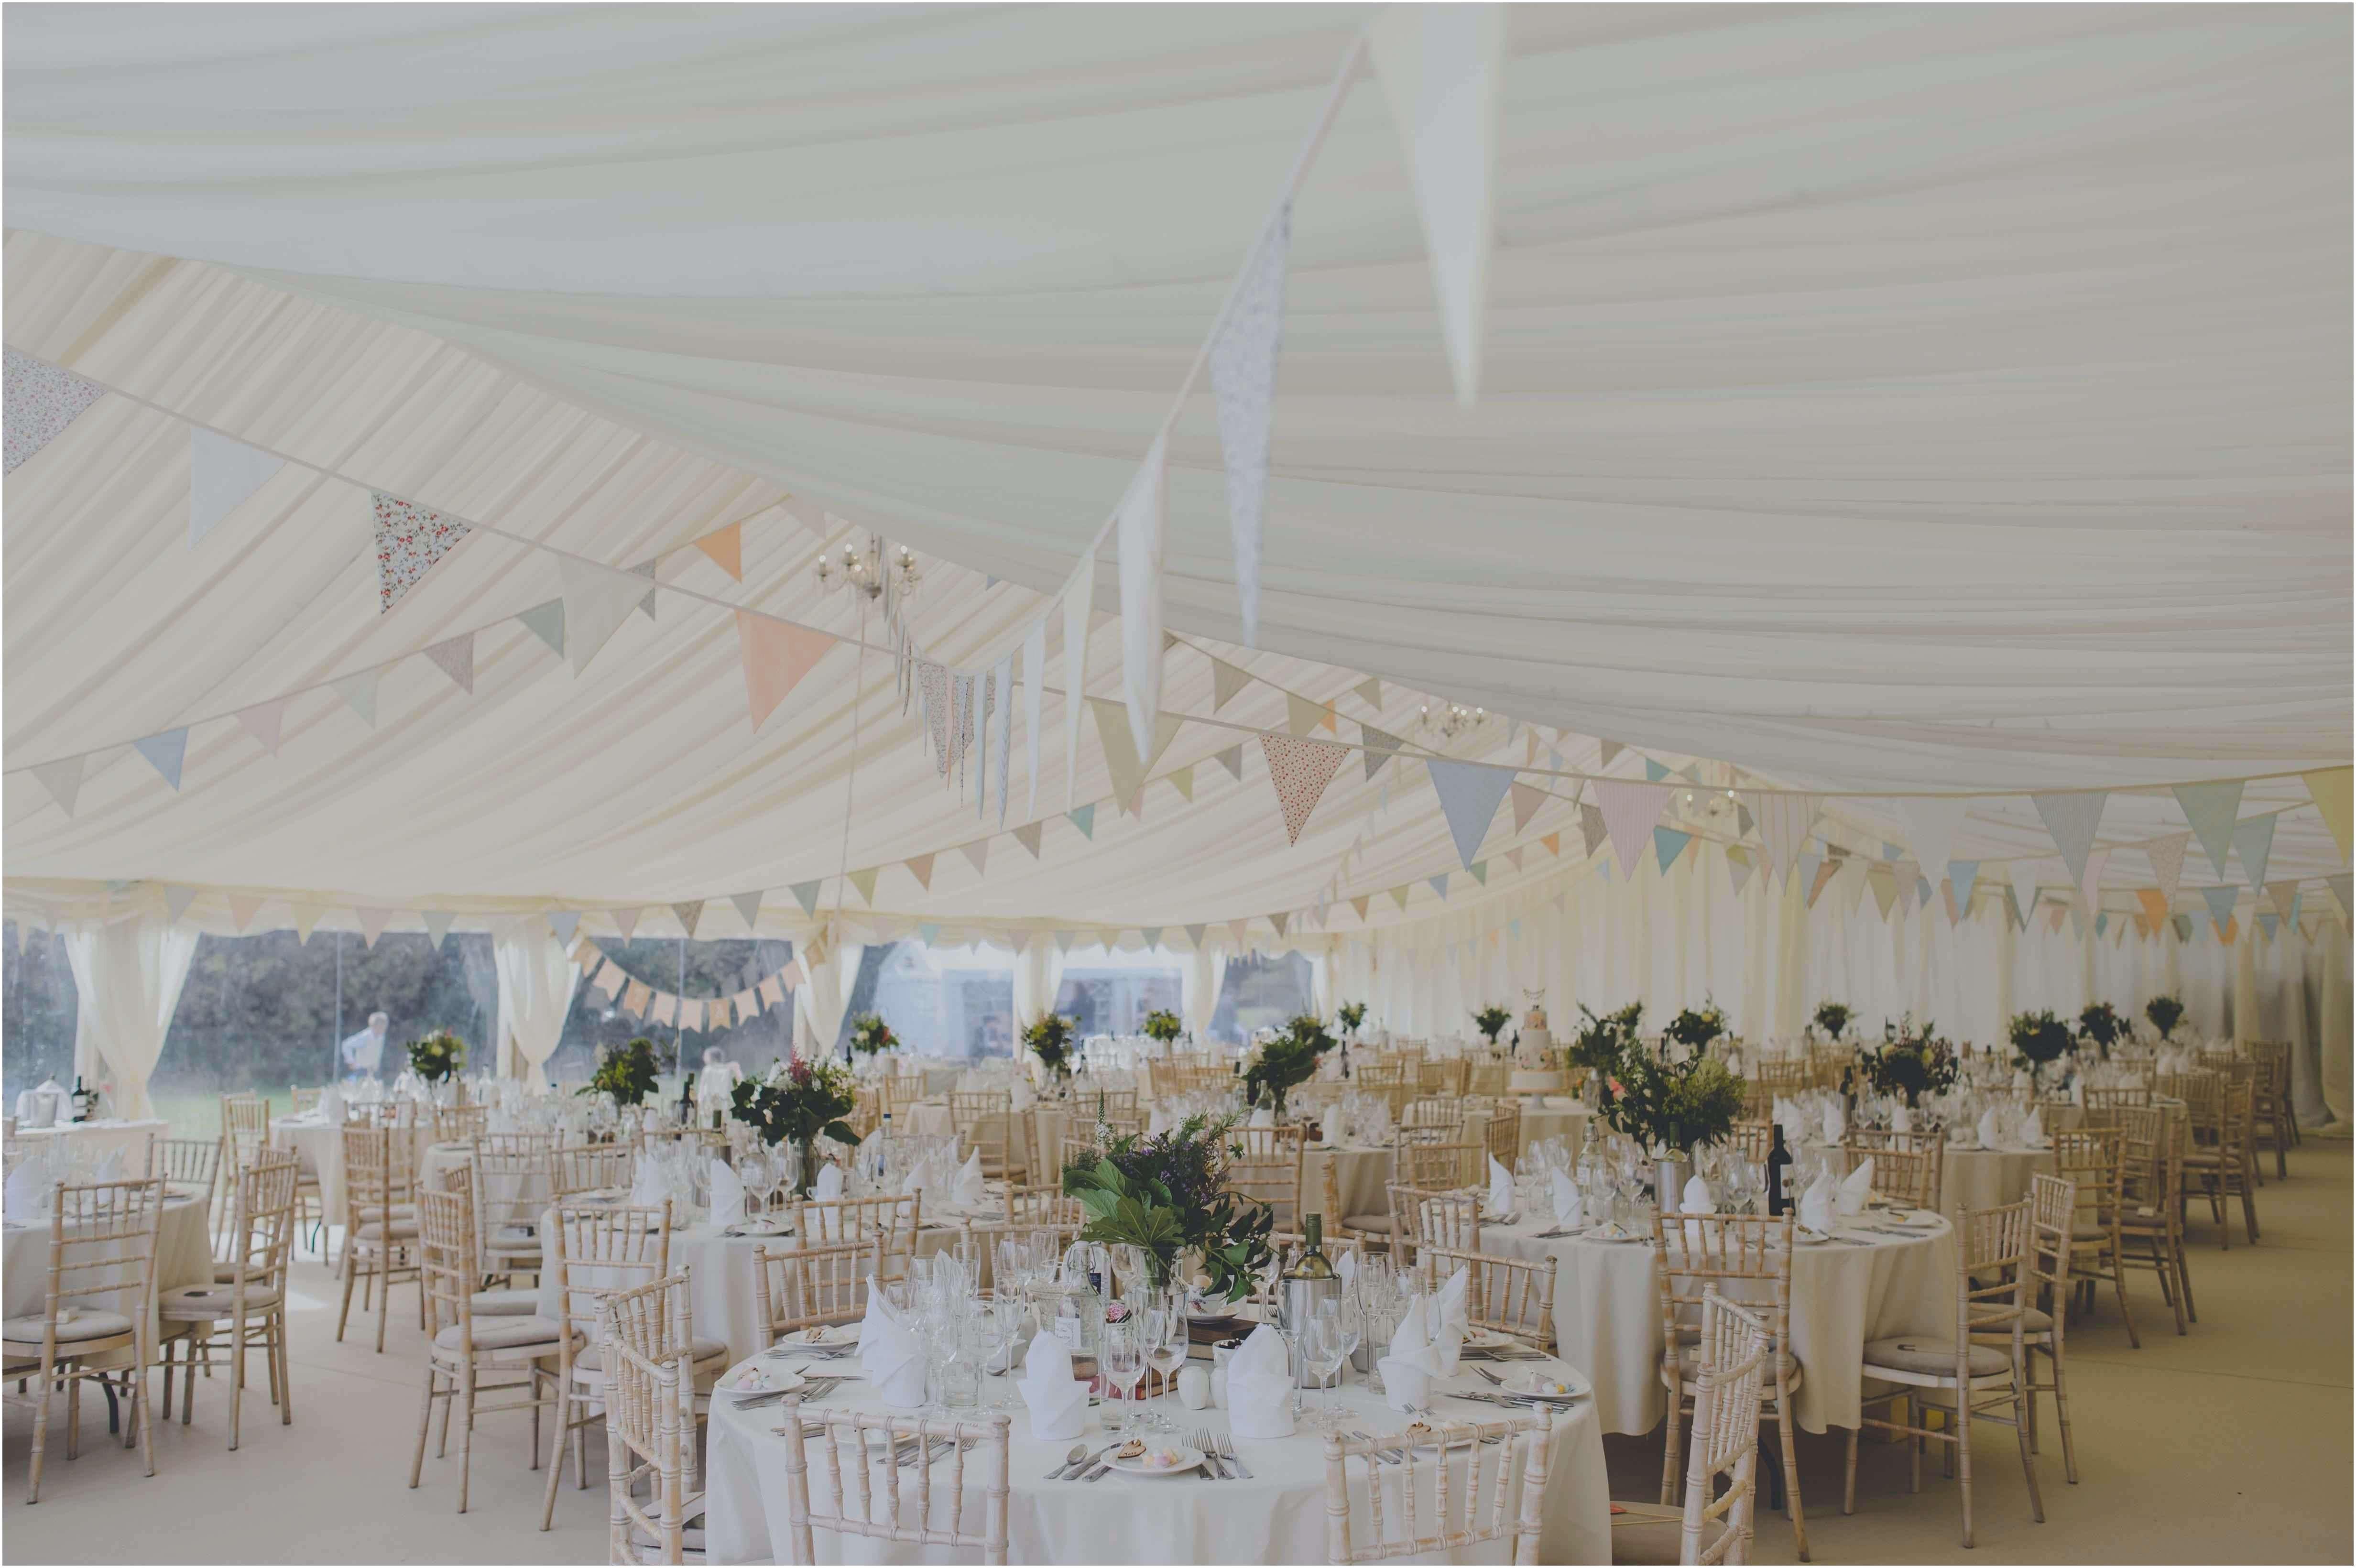 Diy Wedding Ceiling Drape Kits 45 Stylish Wedding Reception Decorations Ideas Concept